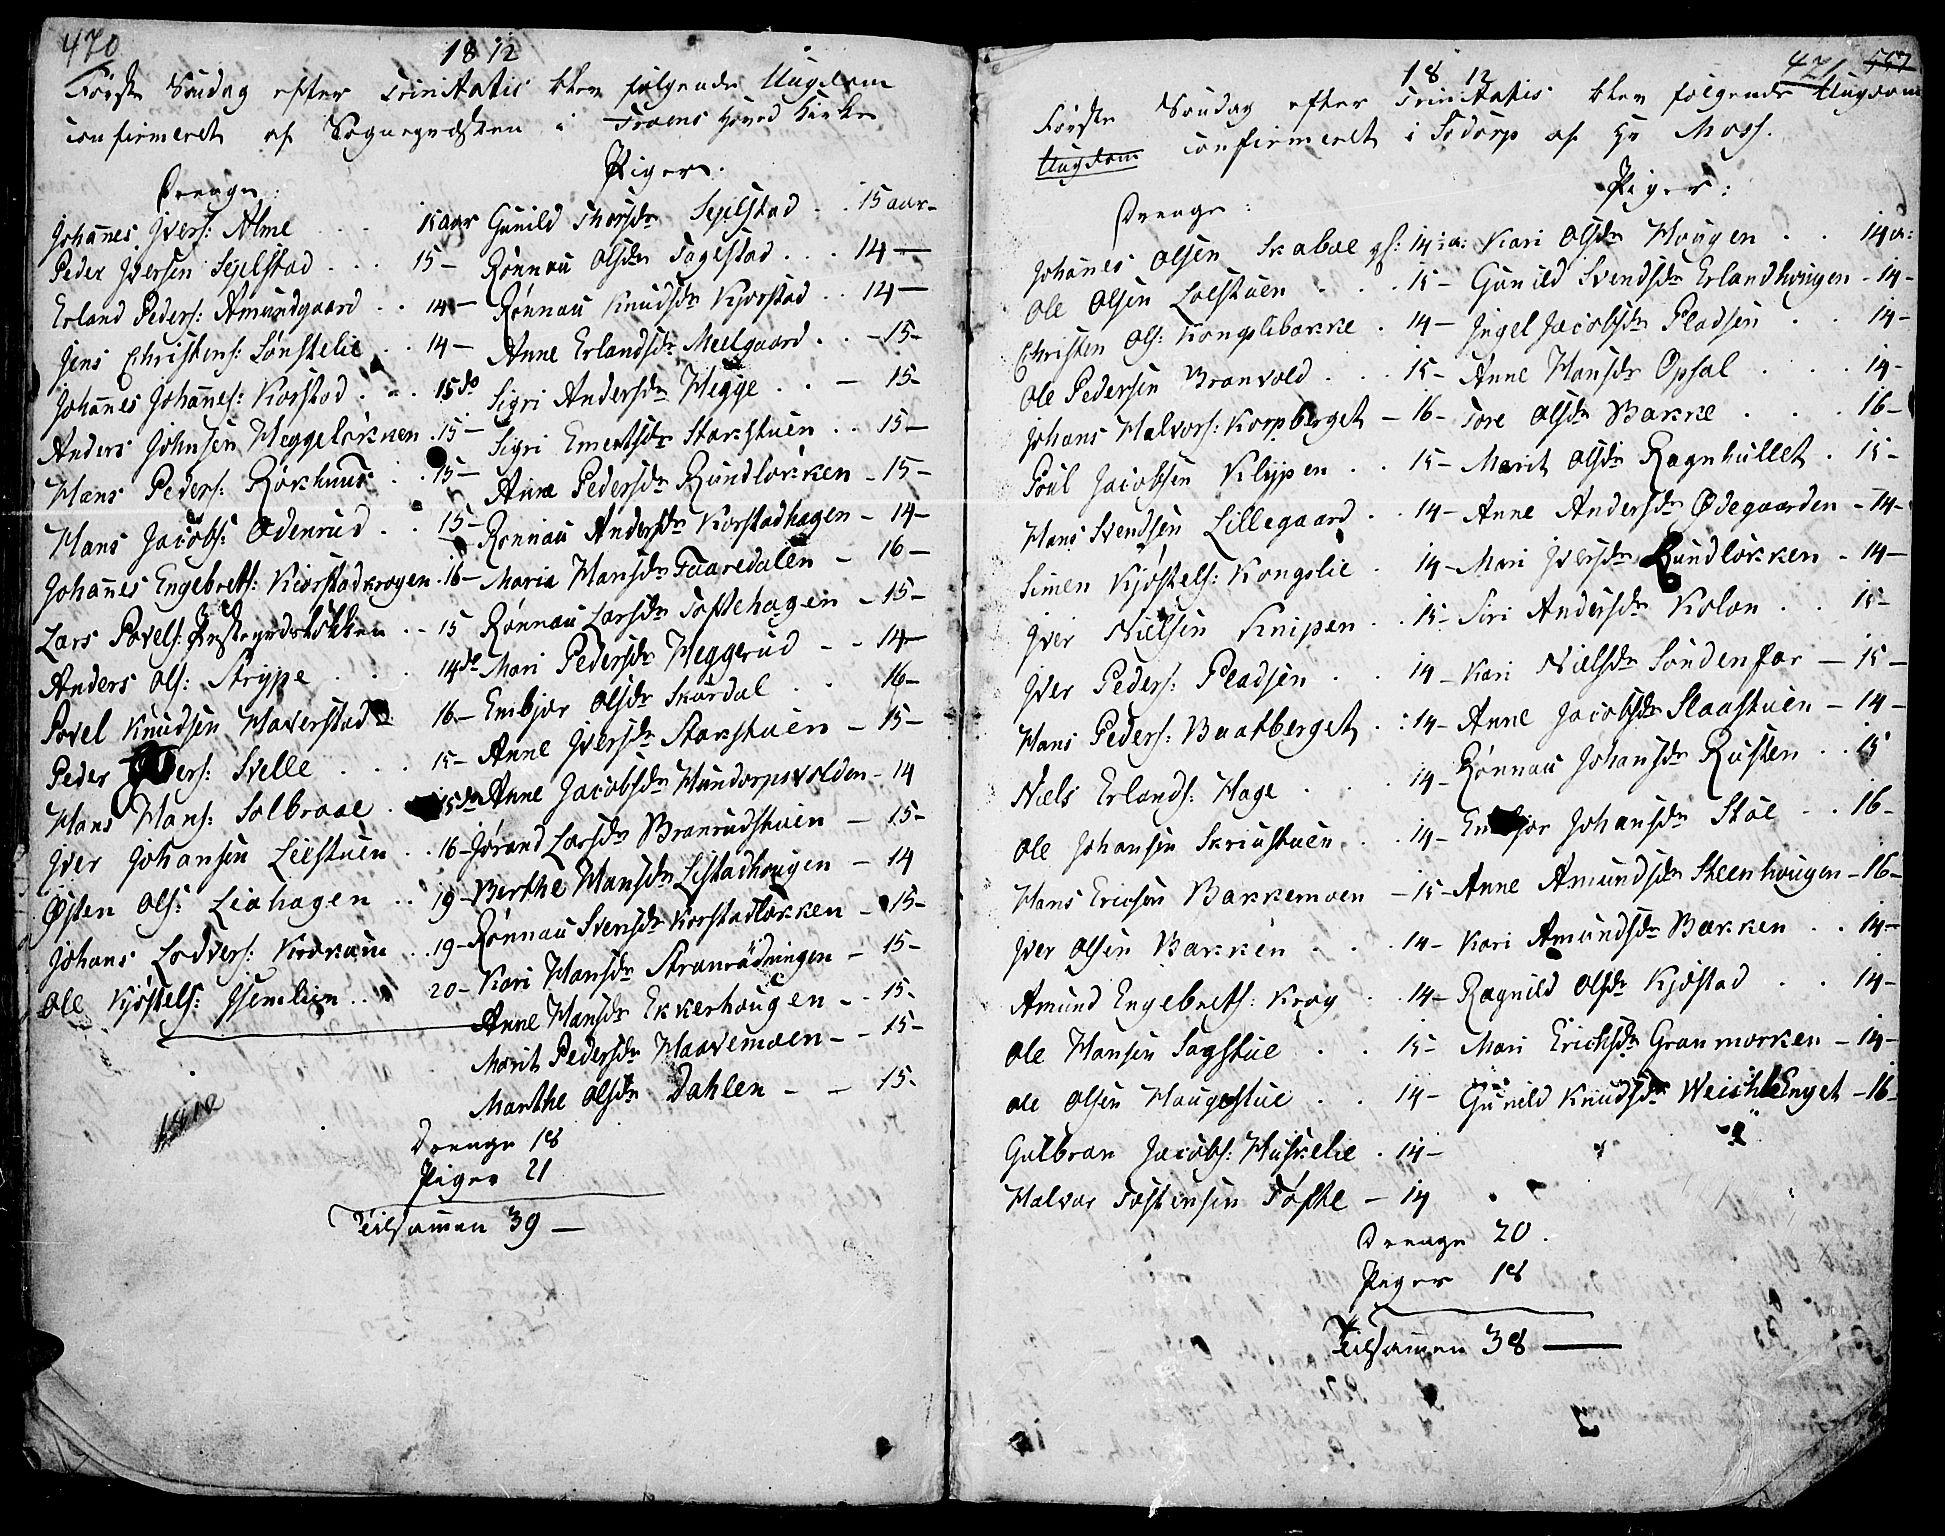 SAH, Fron prestekontor, H/Ha/Haa/L0001: Ministerialbok nr. 1, 1799-1816, s. 470-471